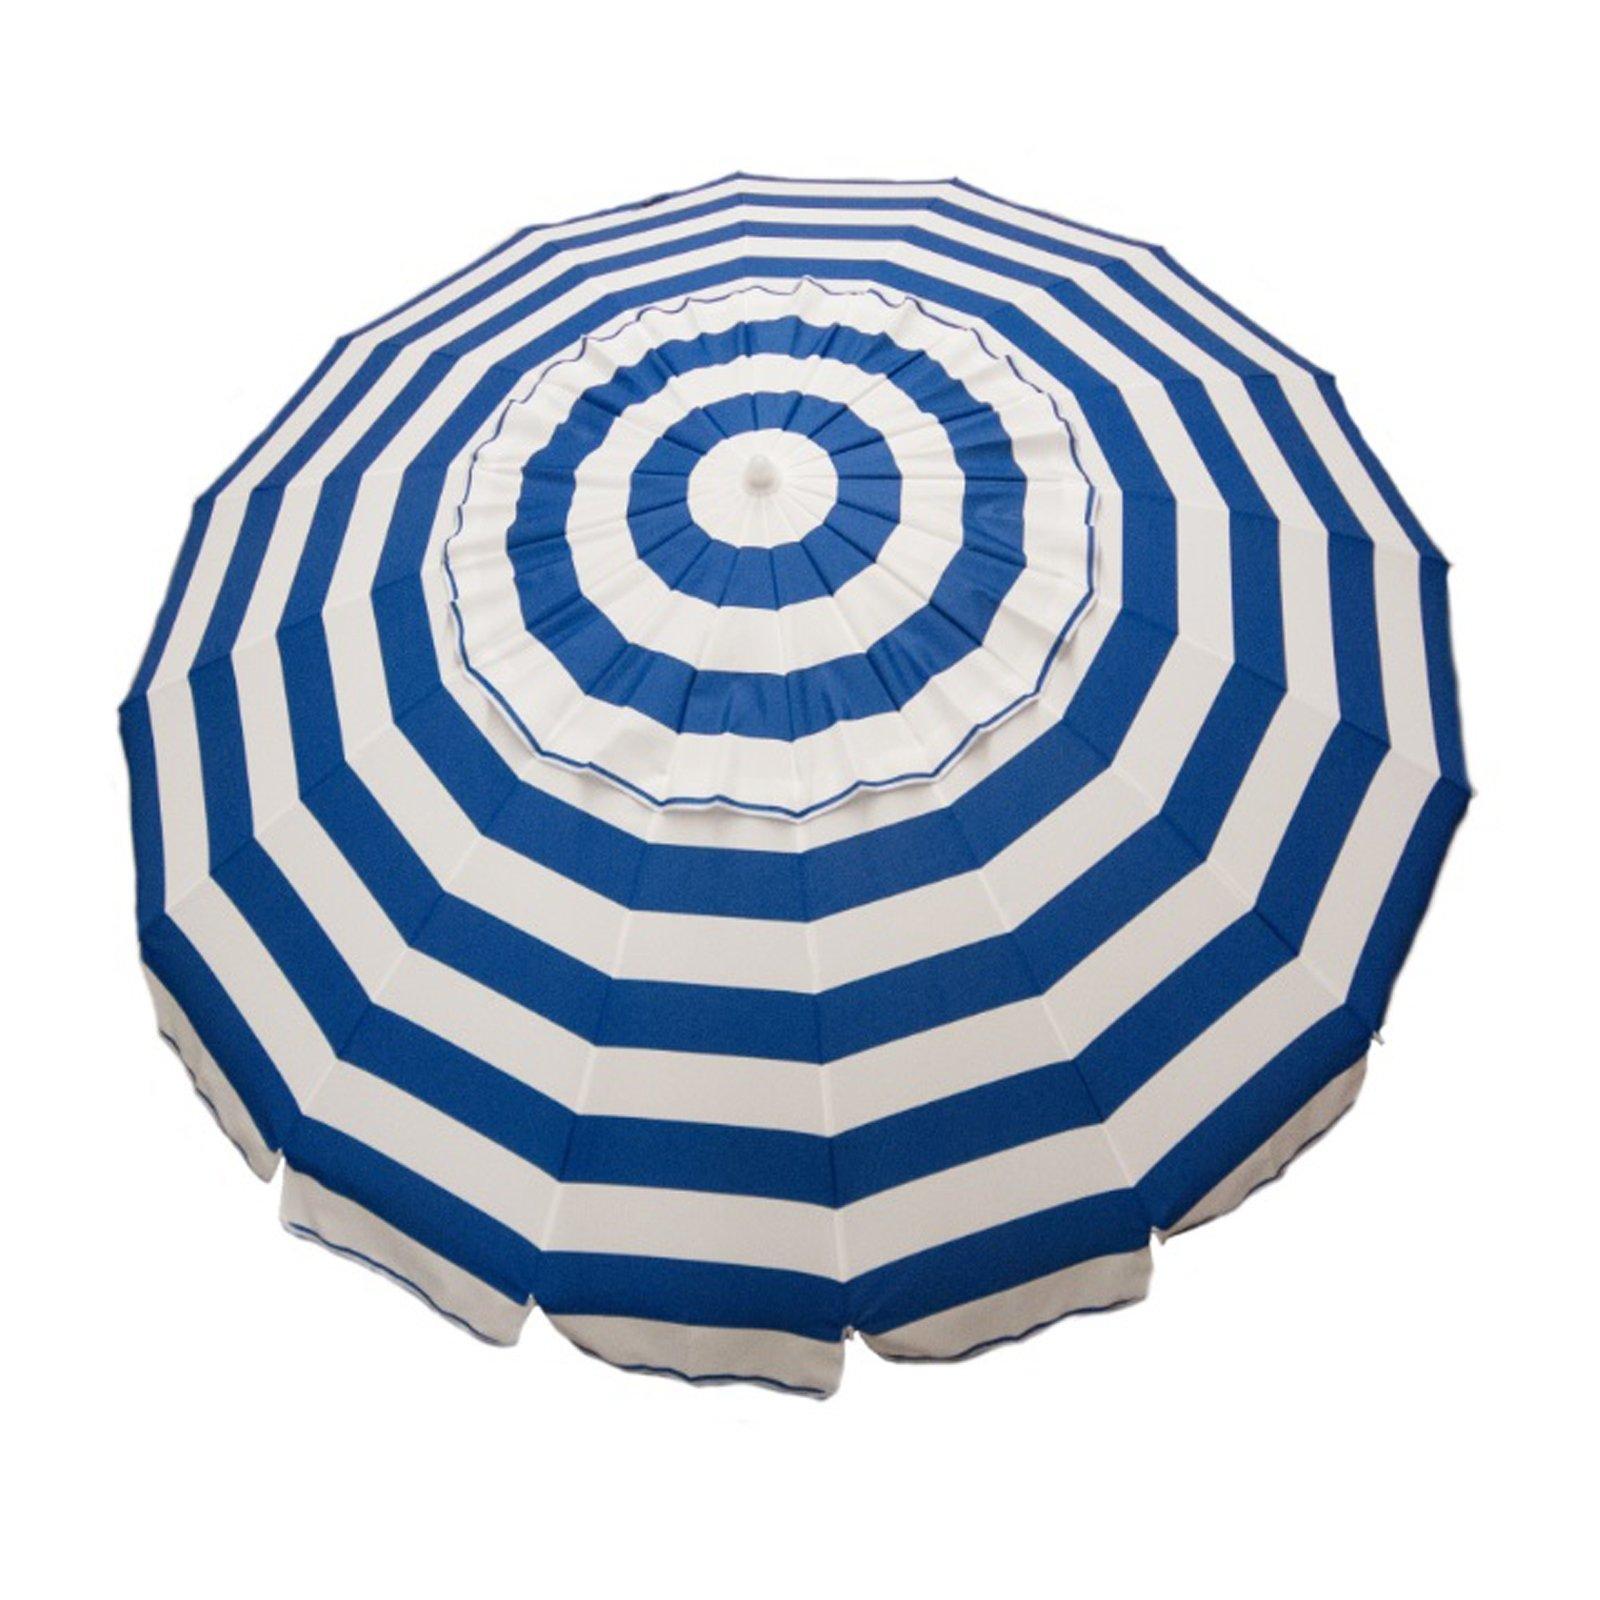 7ft Tilt Outdoor Aluminum Beach Umbrella for Home Patio Sun Shade - Royal Blue